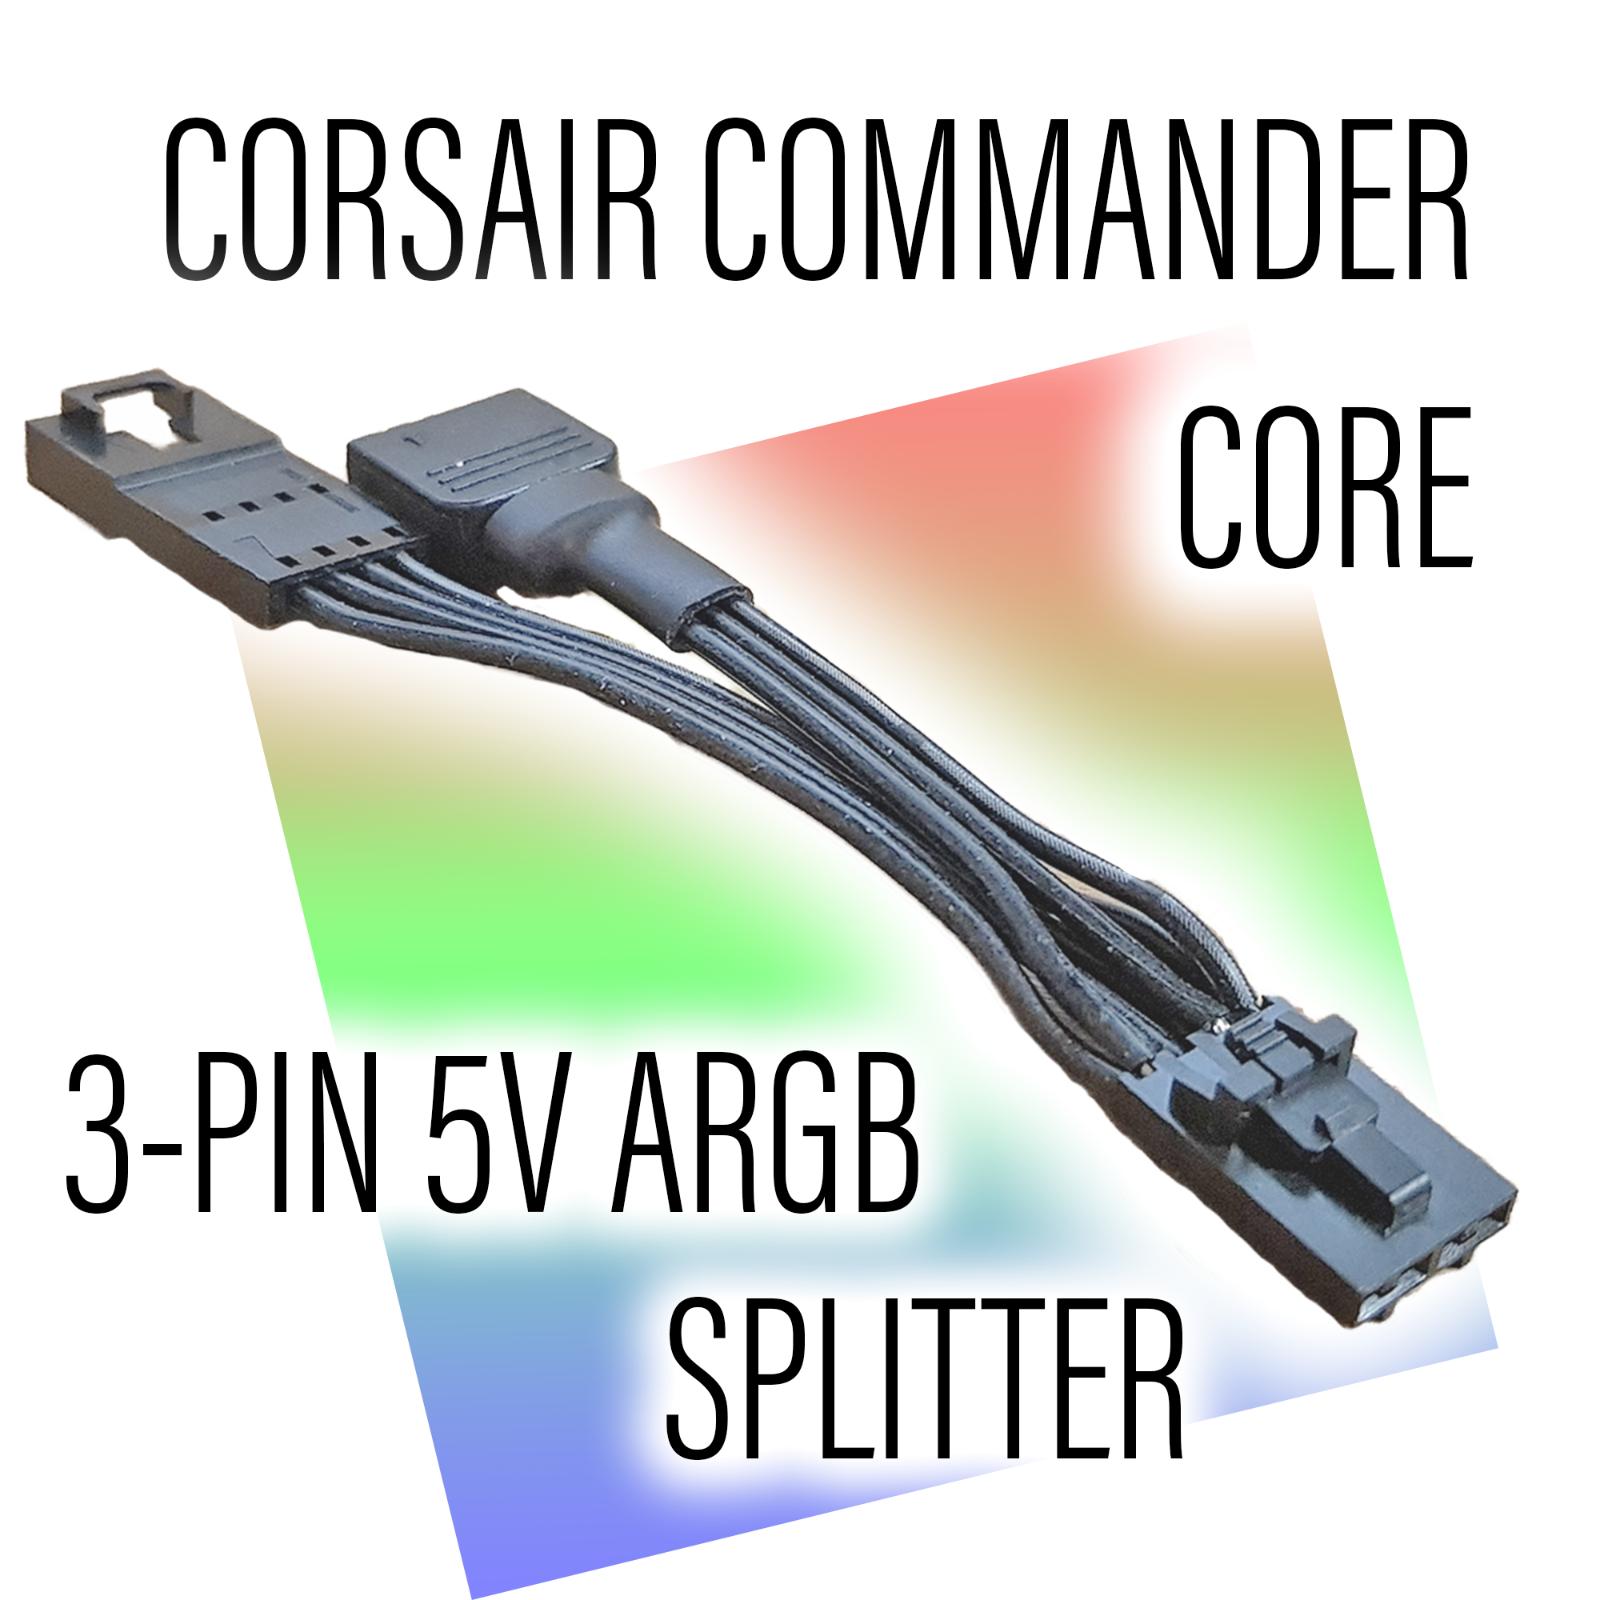 Corsair Commander Core to Standard ARGB3-Pin 5V Splitter Adapter